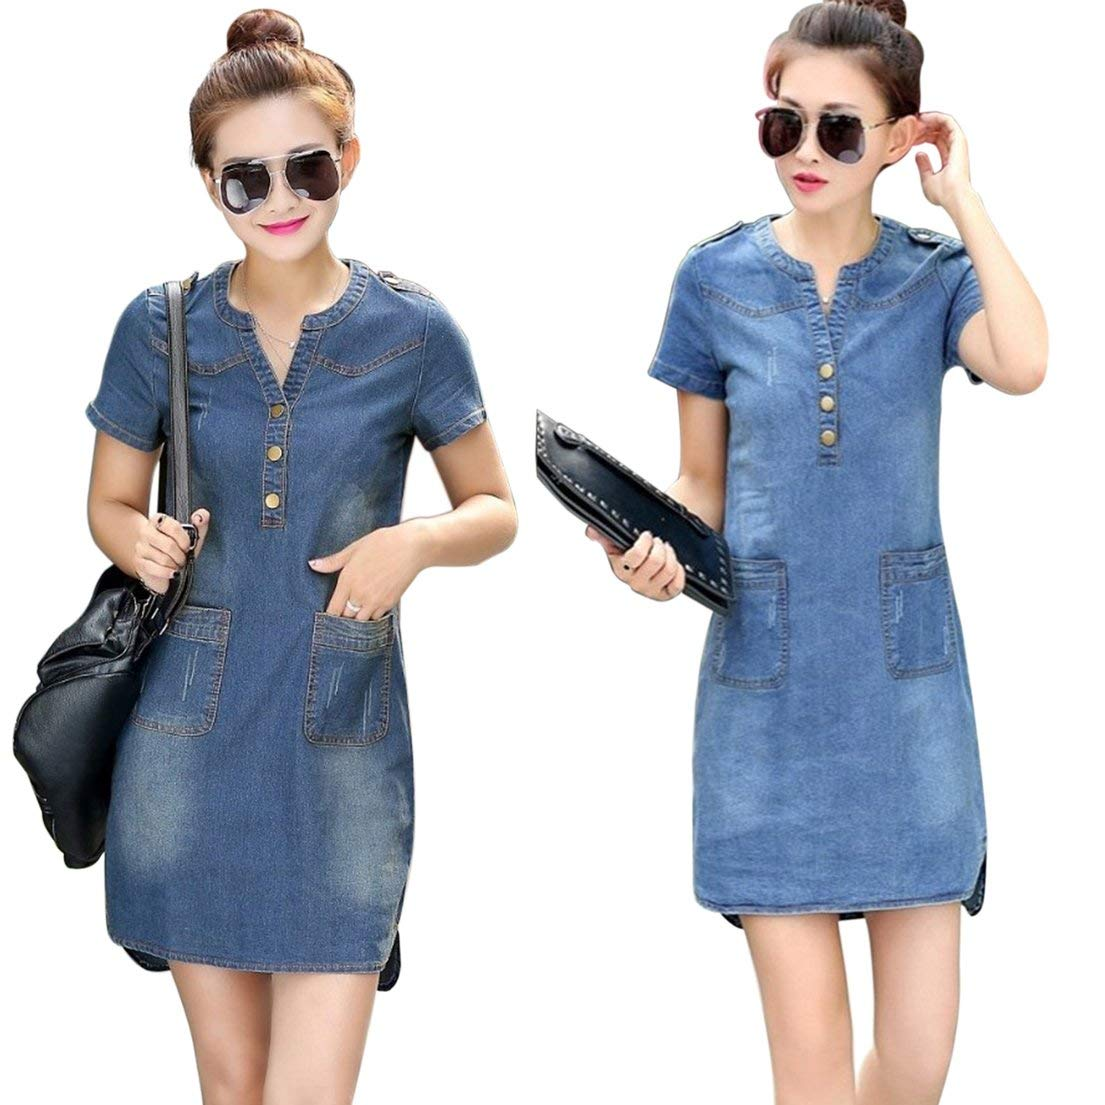 5a3a7e0ee39 Isabelvictoria Summer Short Sleeves Women Denim Dress Loose V-Neck Solid Denim  Dress Slim Thin Dresses Women Bodycon Female Clothing - Dark Blue M: ...